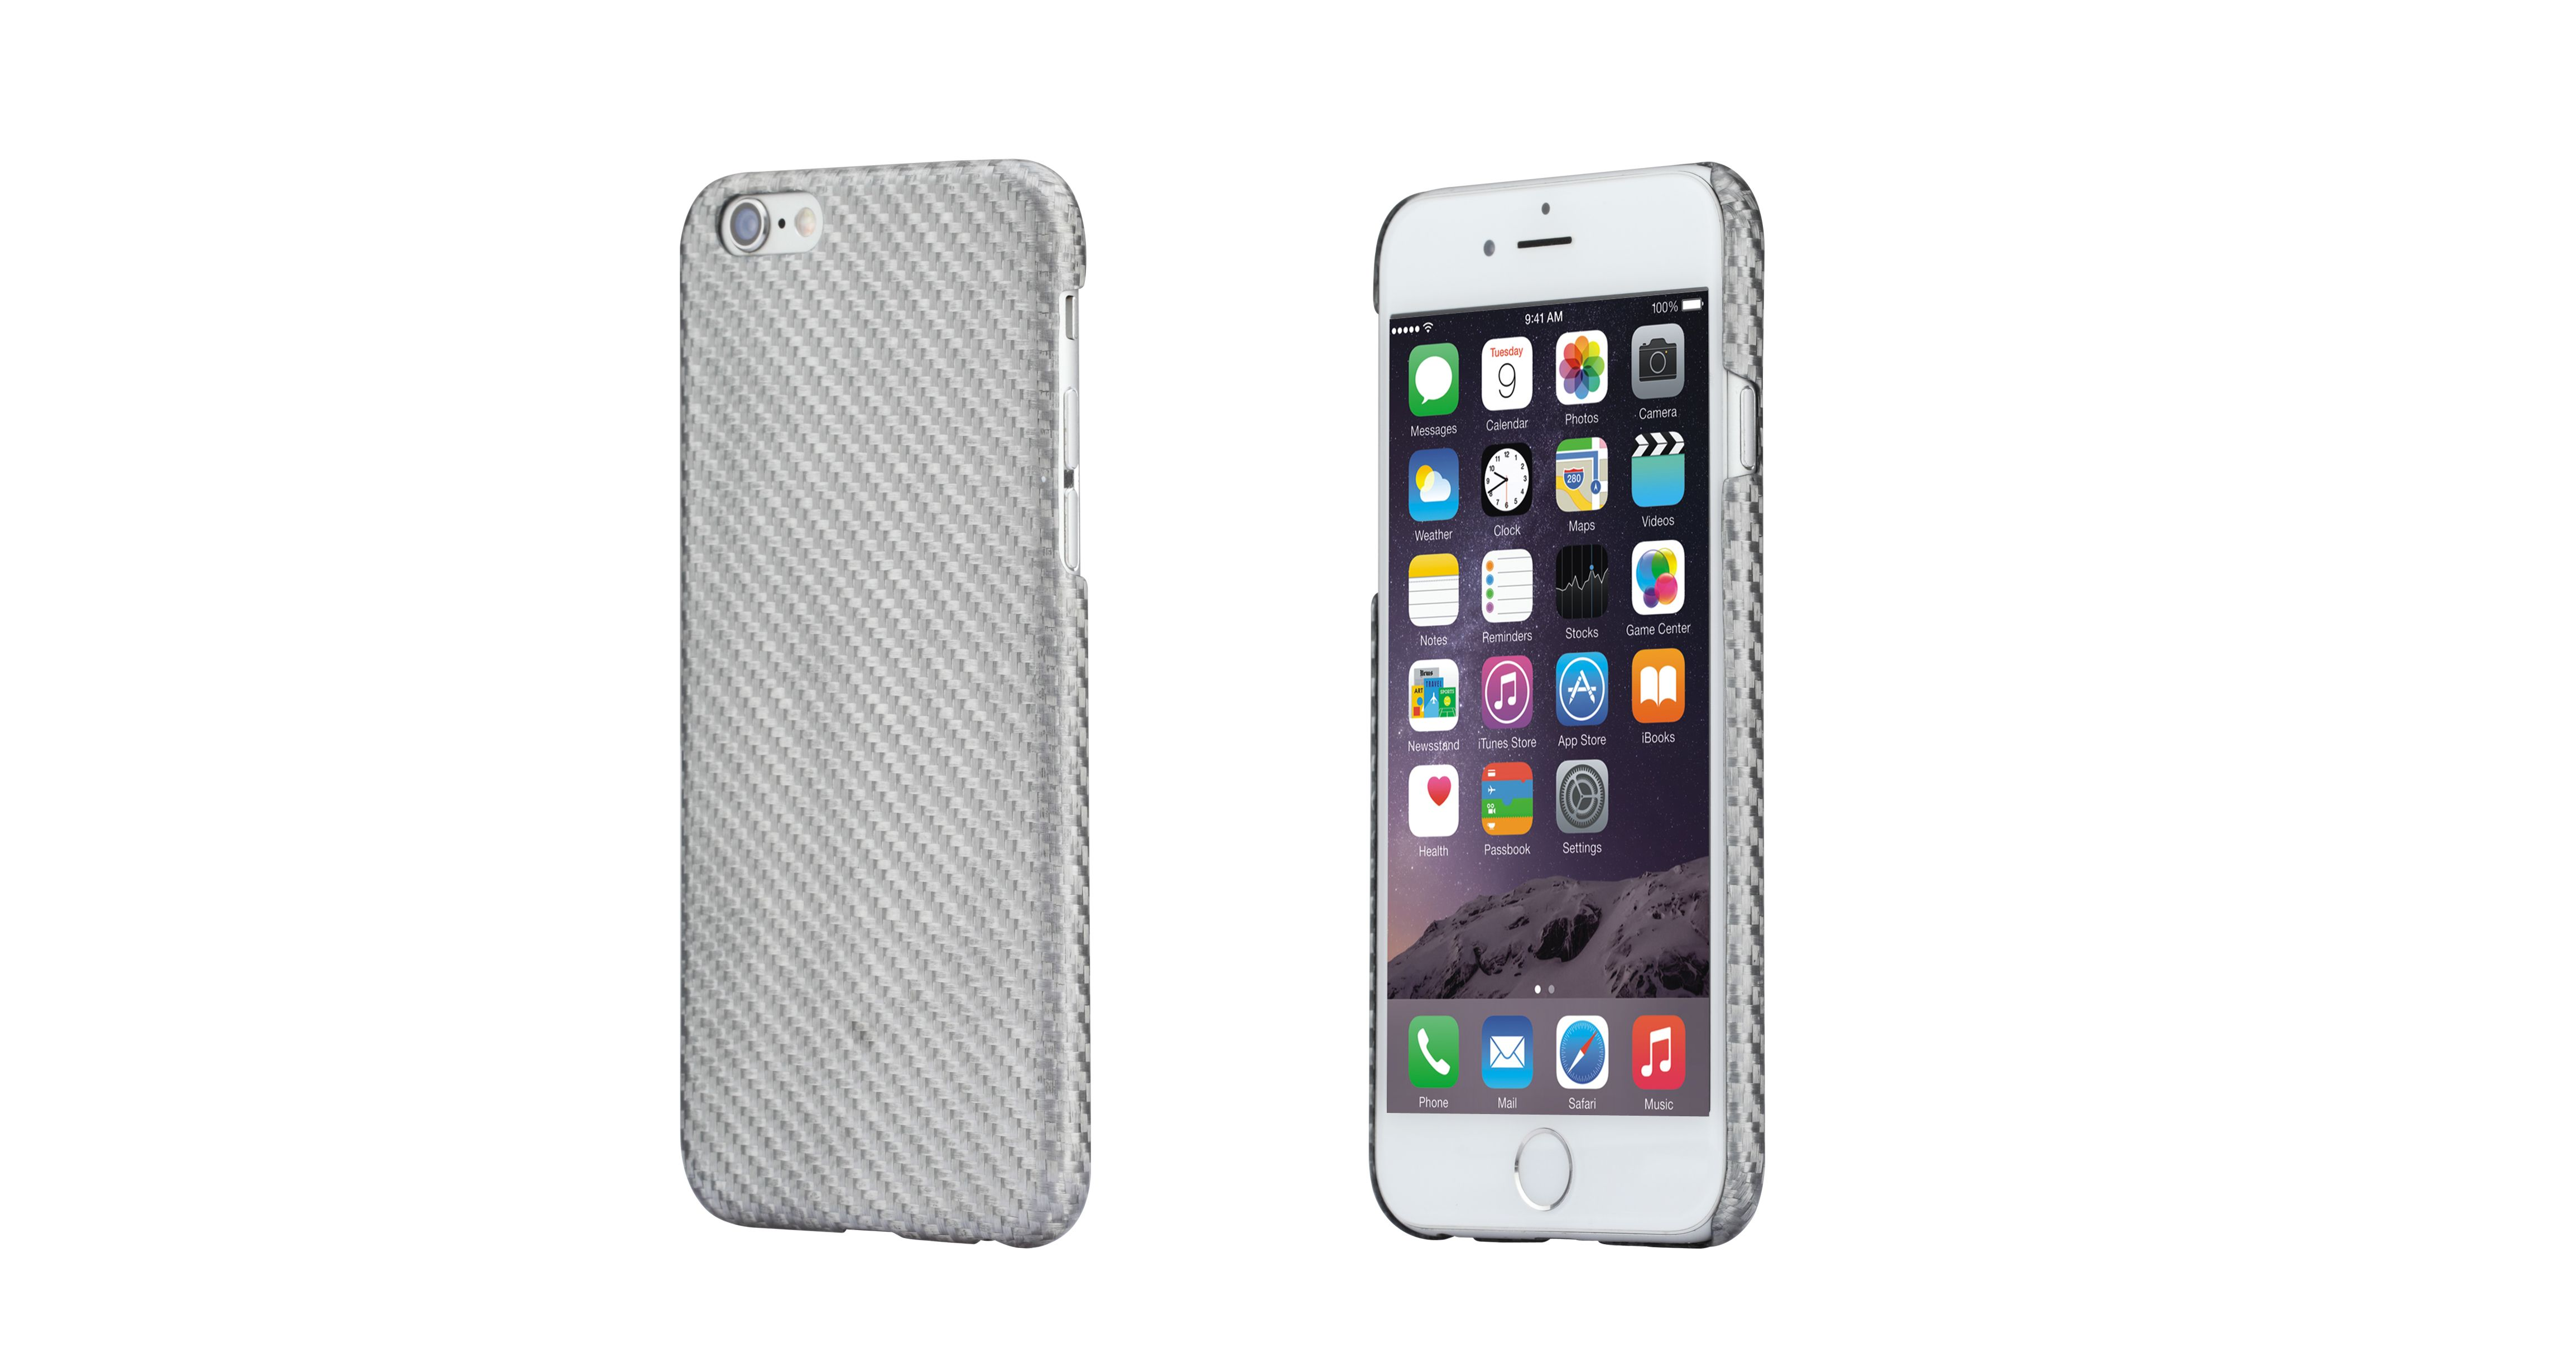 Glass fibre phone case probably your last phone case